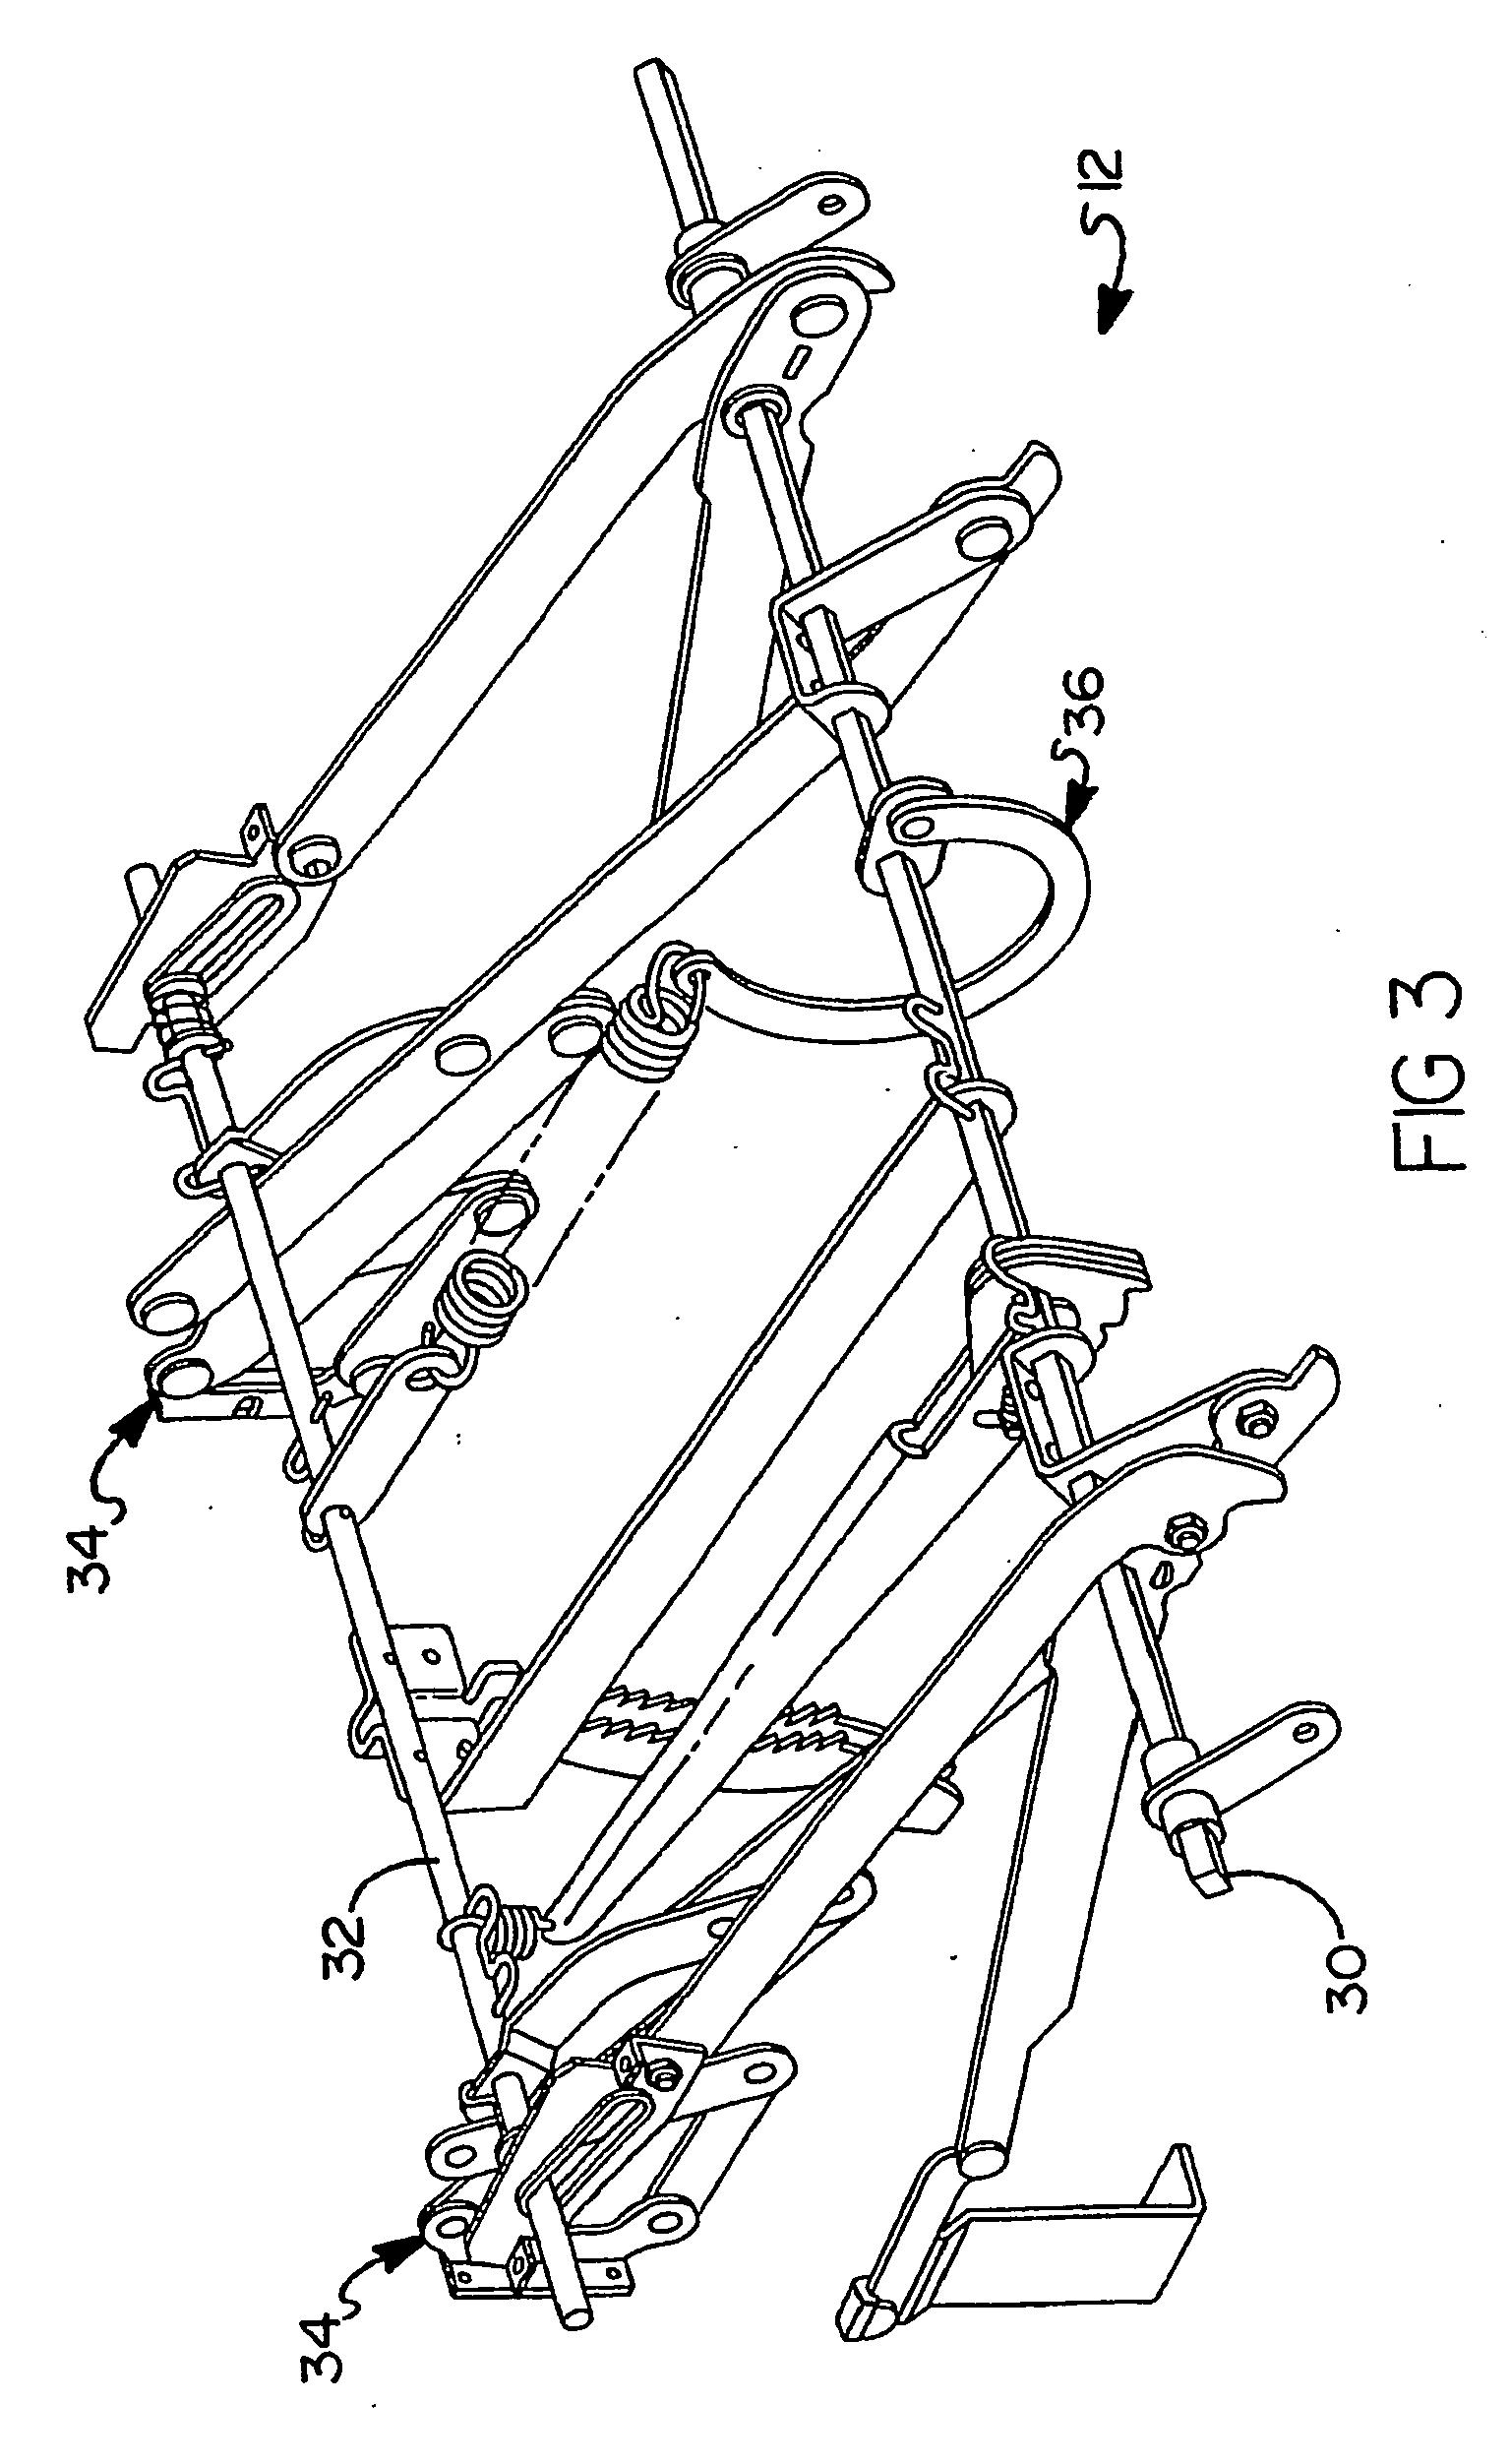 kawasaki klr650 color wiring diagram pictures 2004 toyota